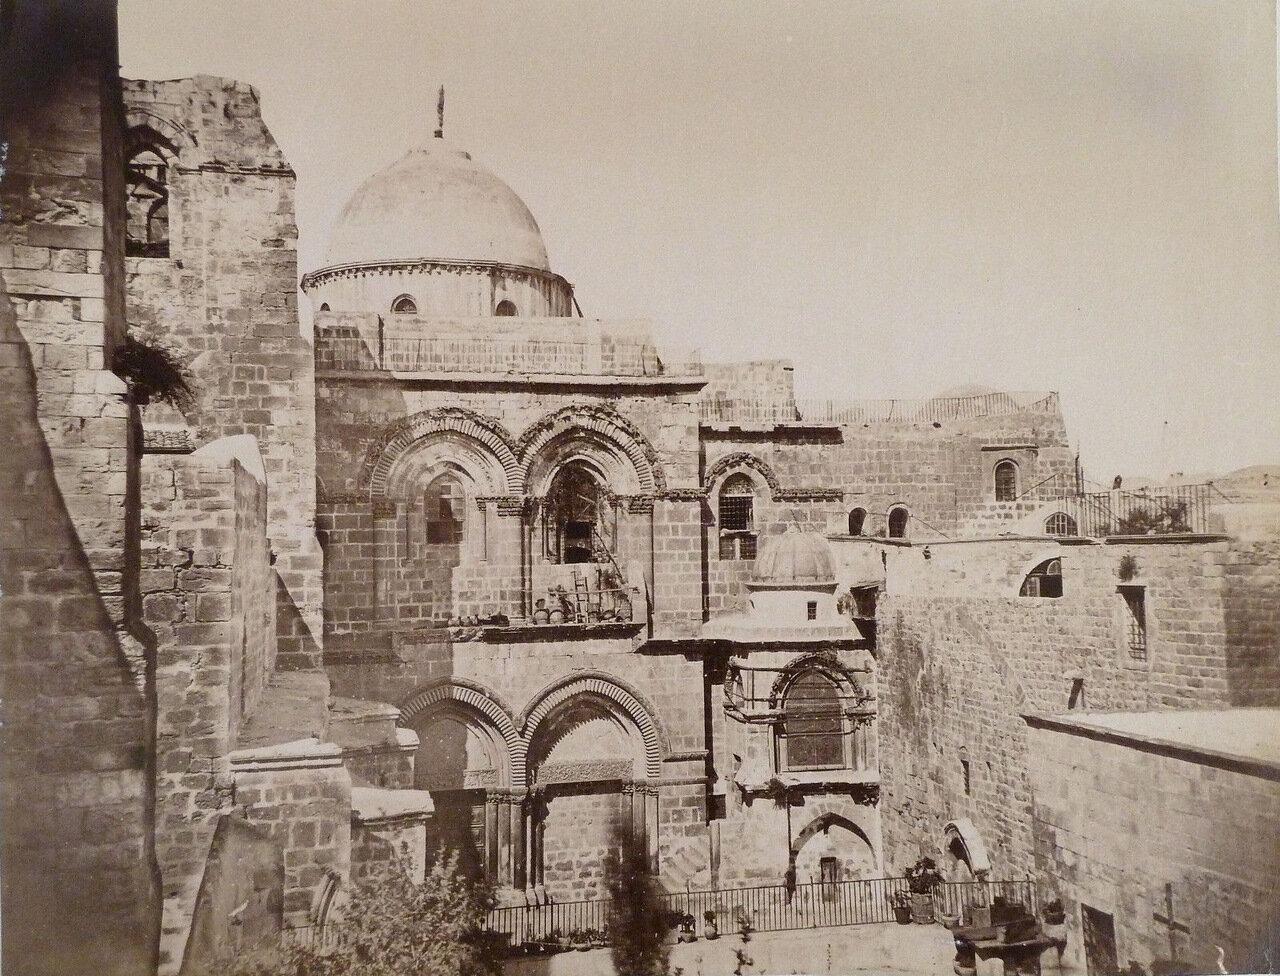 Иерусалим. Храм Гроба Господня. 1881.